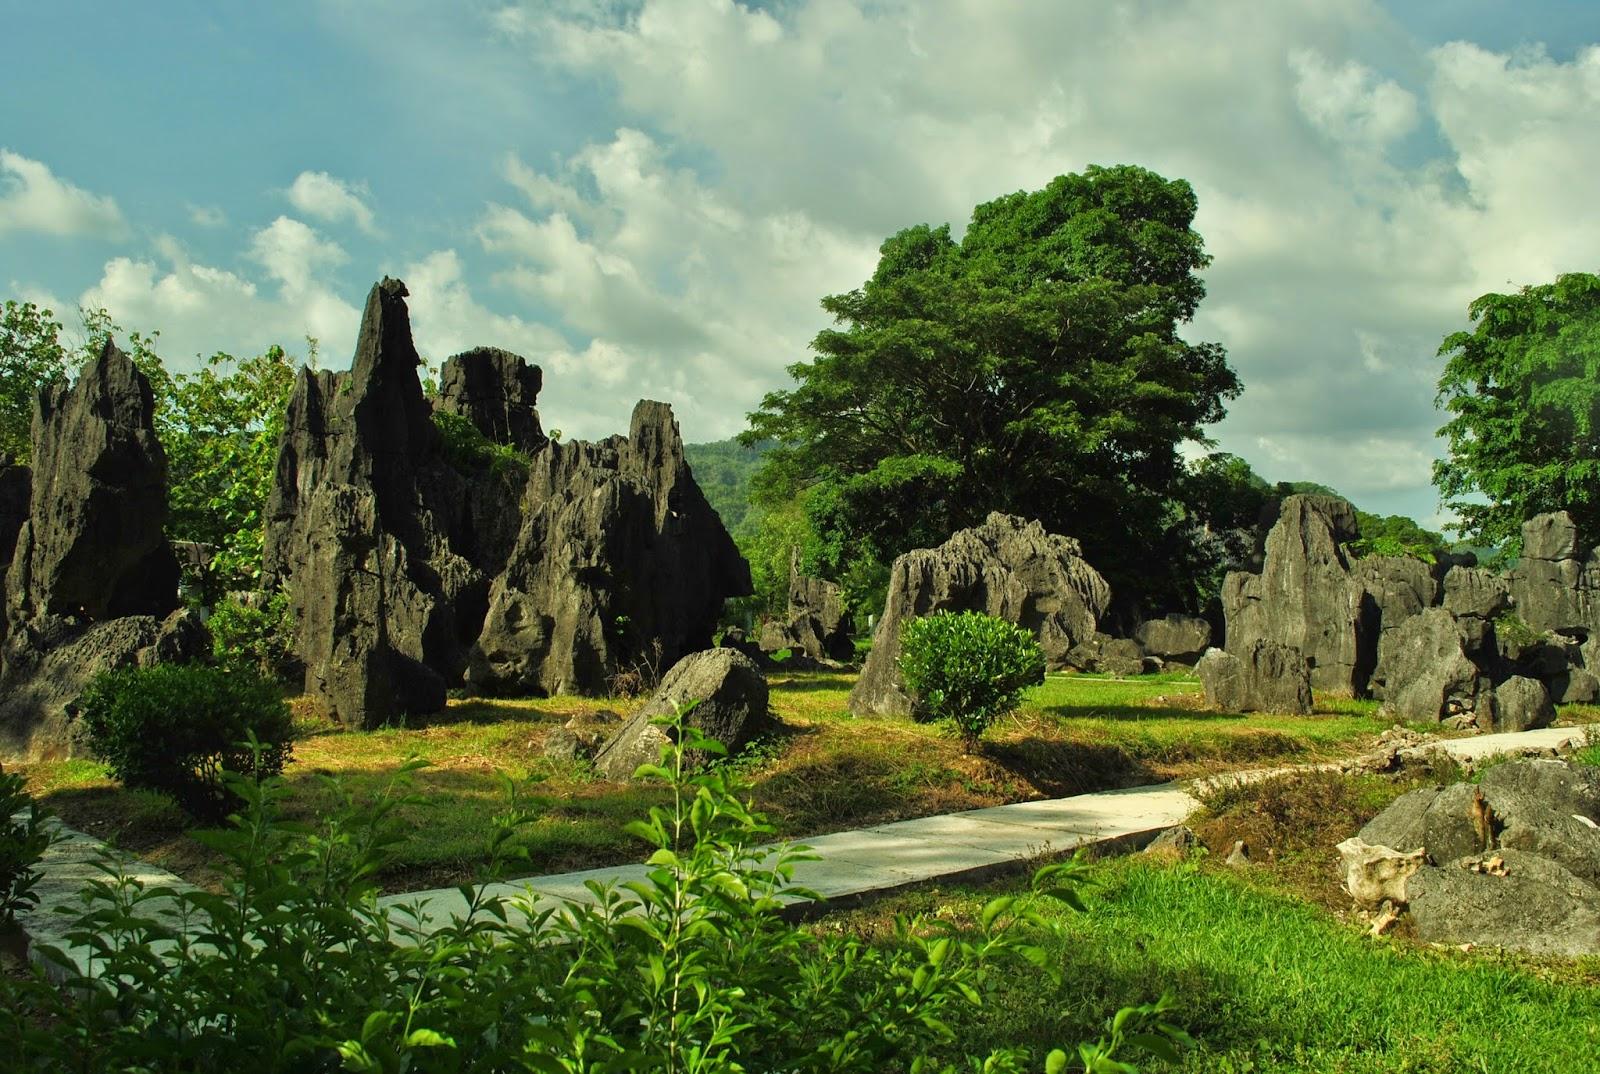 Menikmati Suasana Romantis Di 6 Tempat Wisata Valentine Makassar Populer